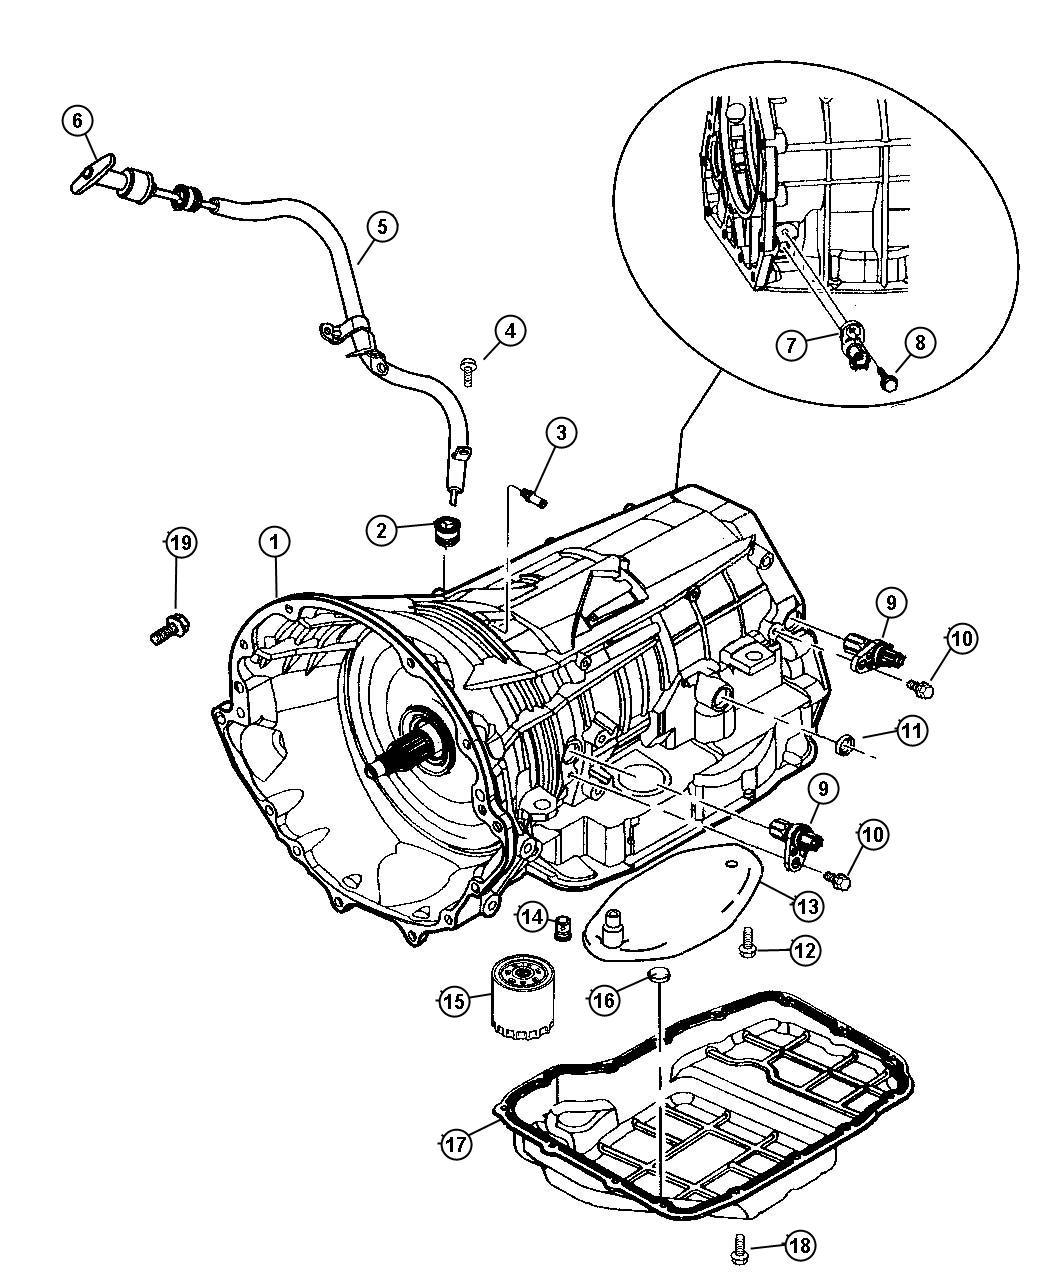 2013 Dodge Transducer. Pressure sensor. 52119098, 52119099